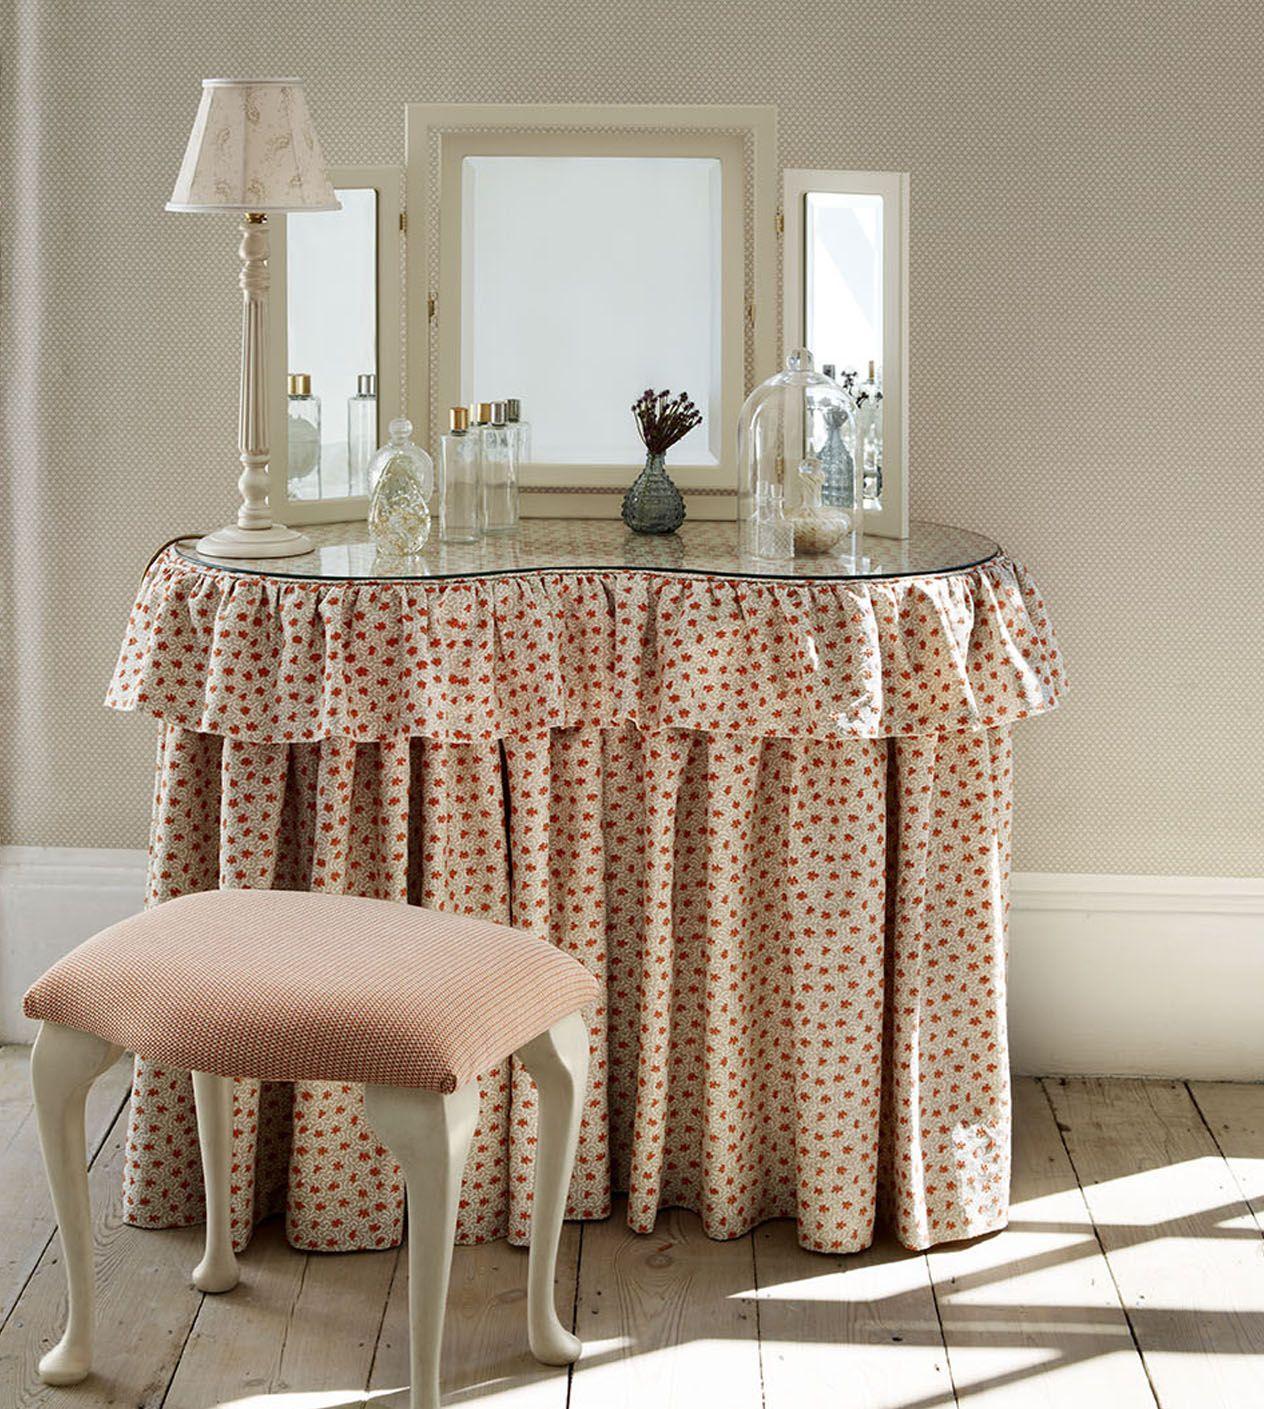 Dressing Table Skirts   … Soft Furnishings » Covers for kidney or rectangular…